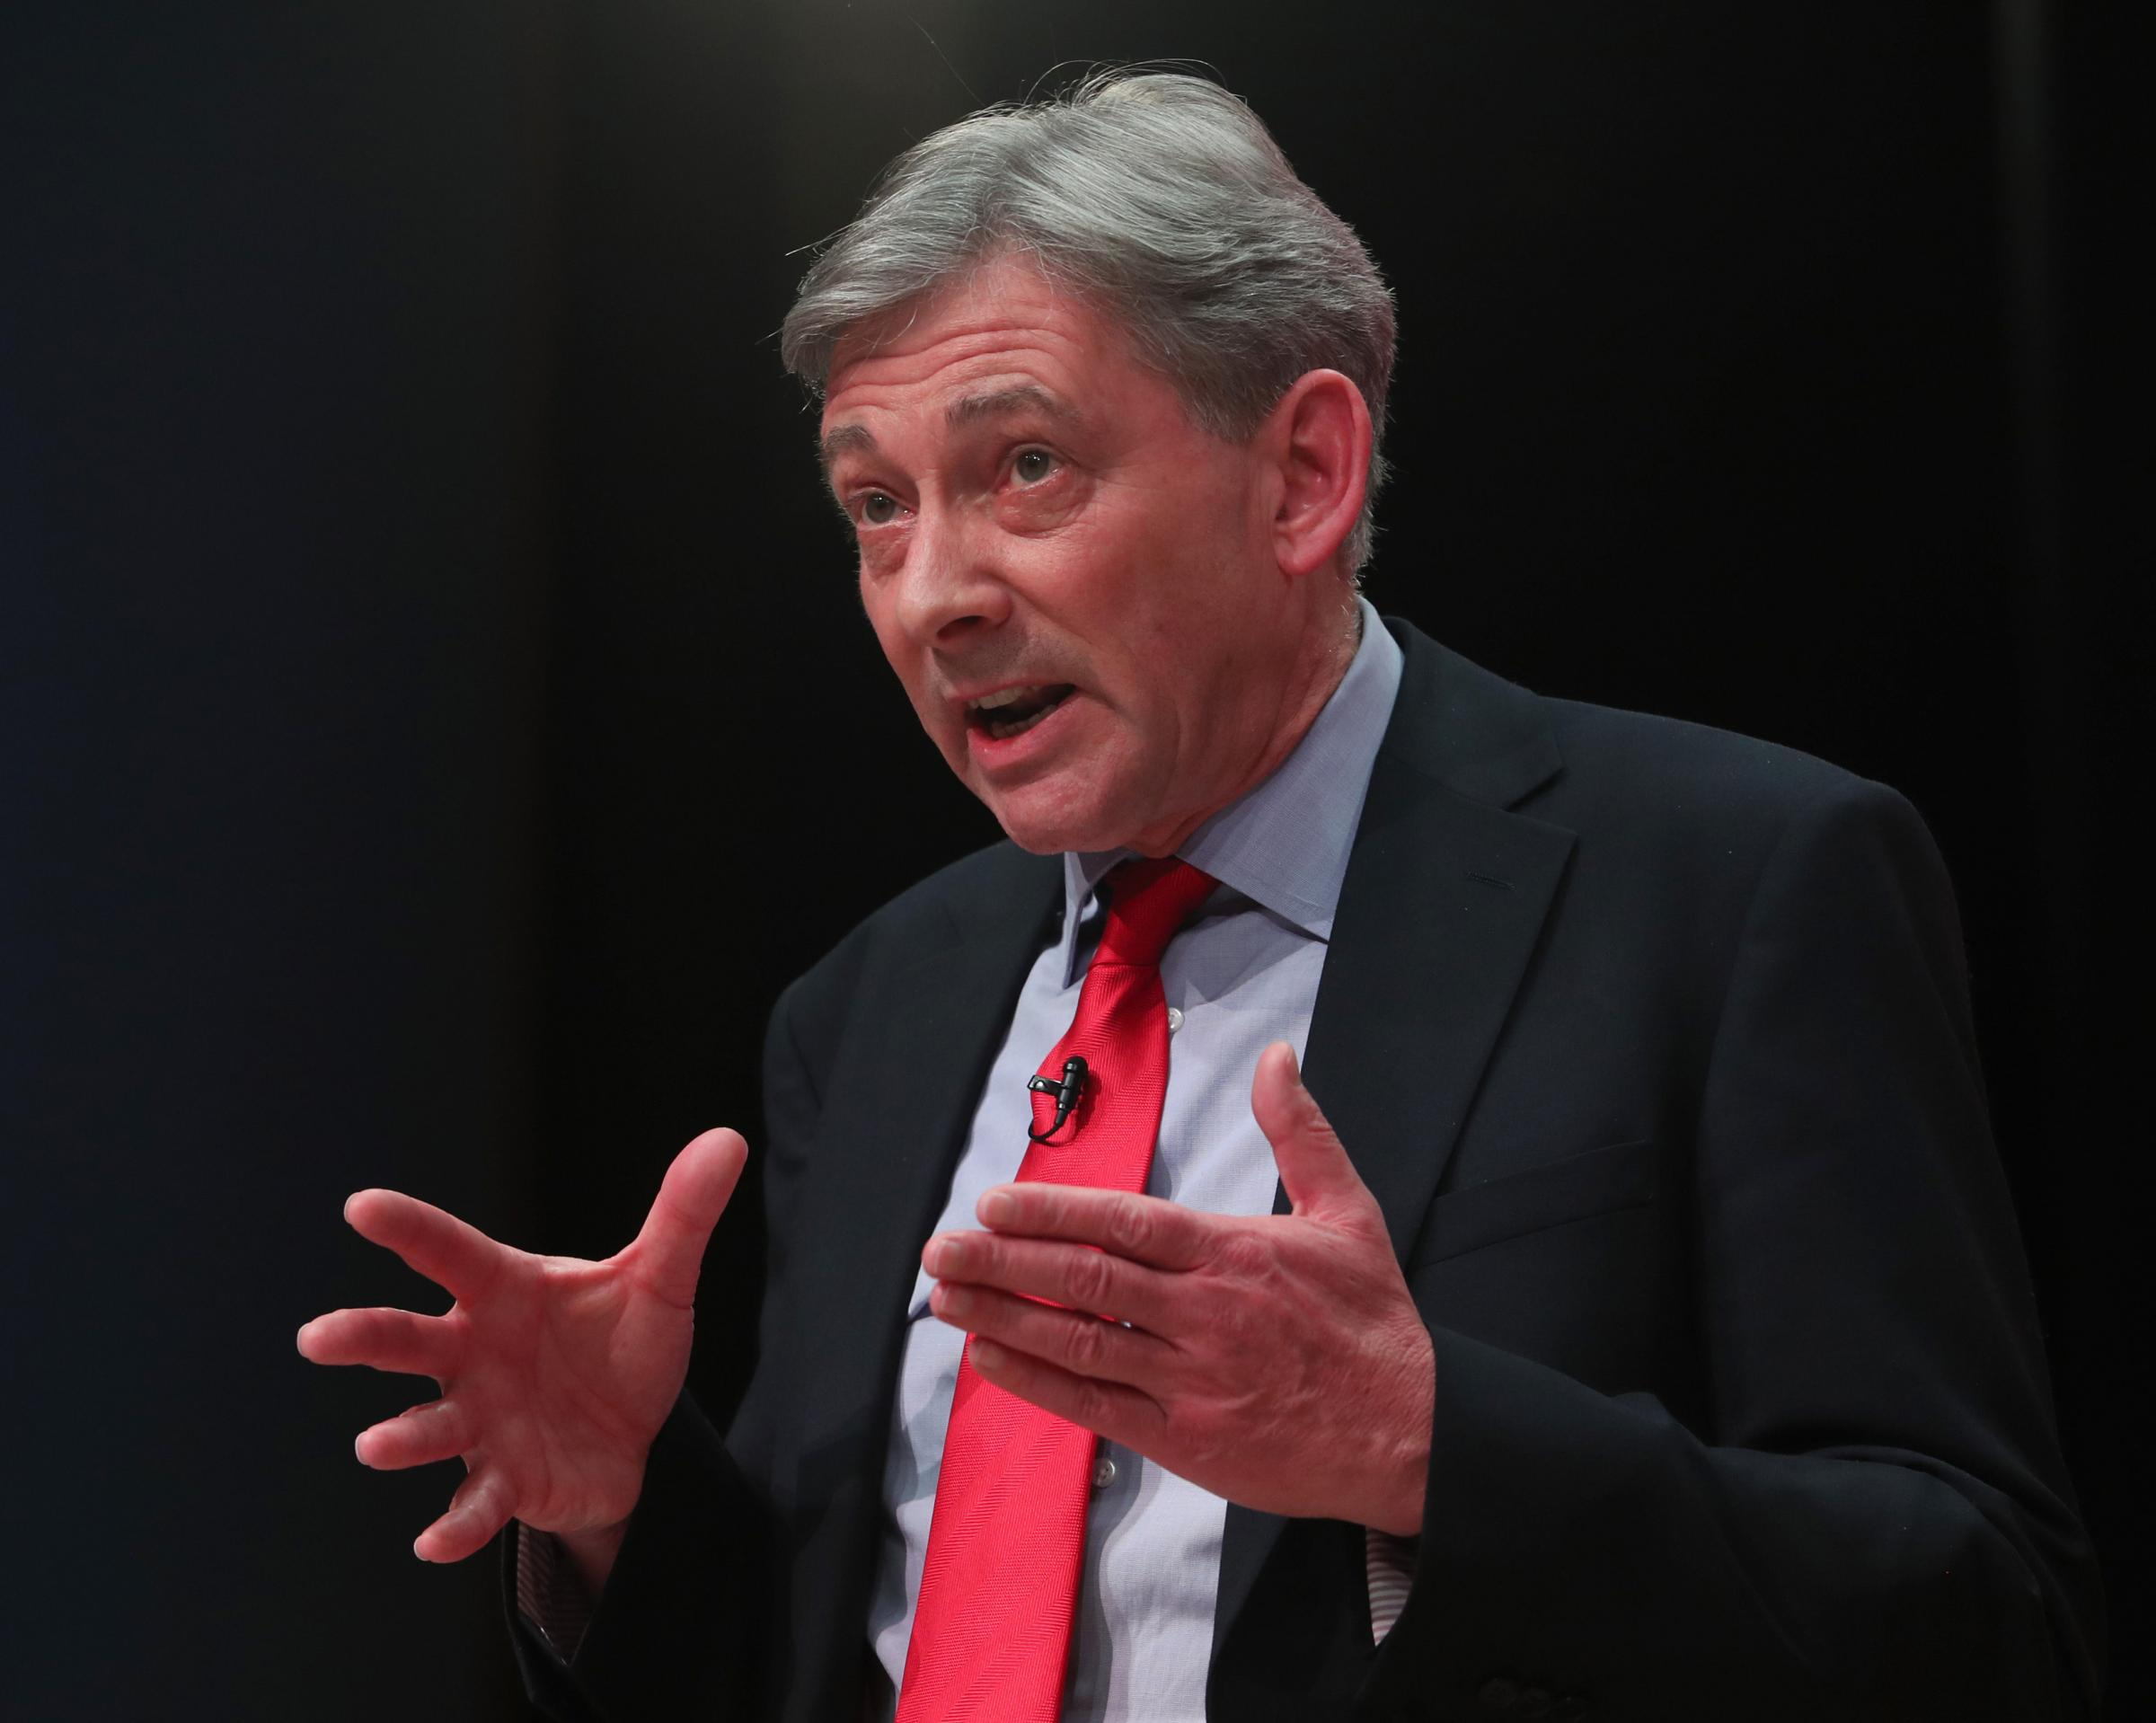 Political crisis in United Kingdom ahead of Brexit debate